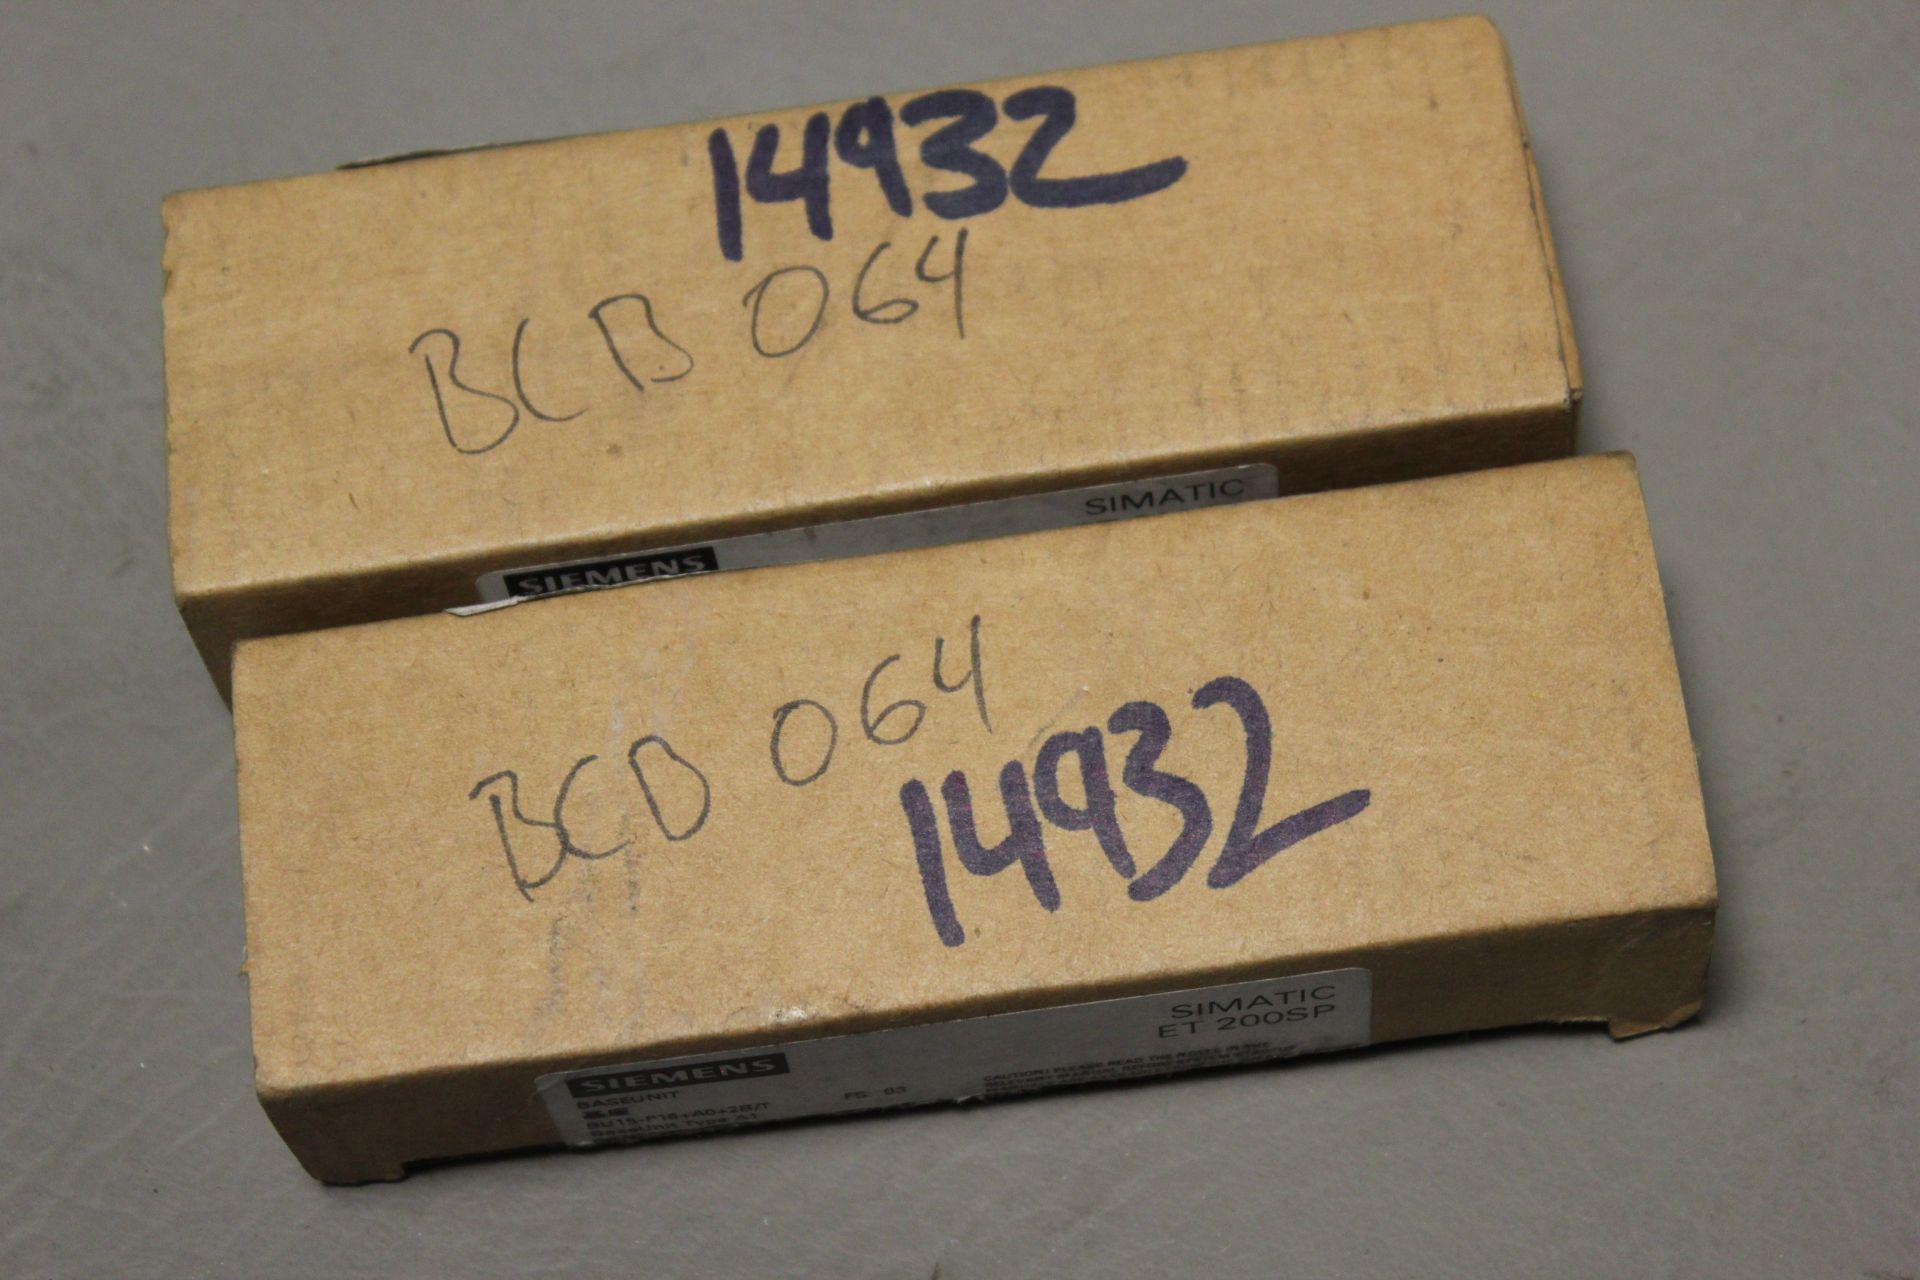 LOT OF NEW SIEMENS PLC BASE UNITS - Image 4 of 5